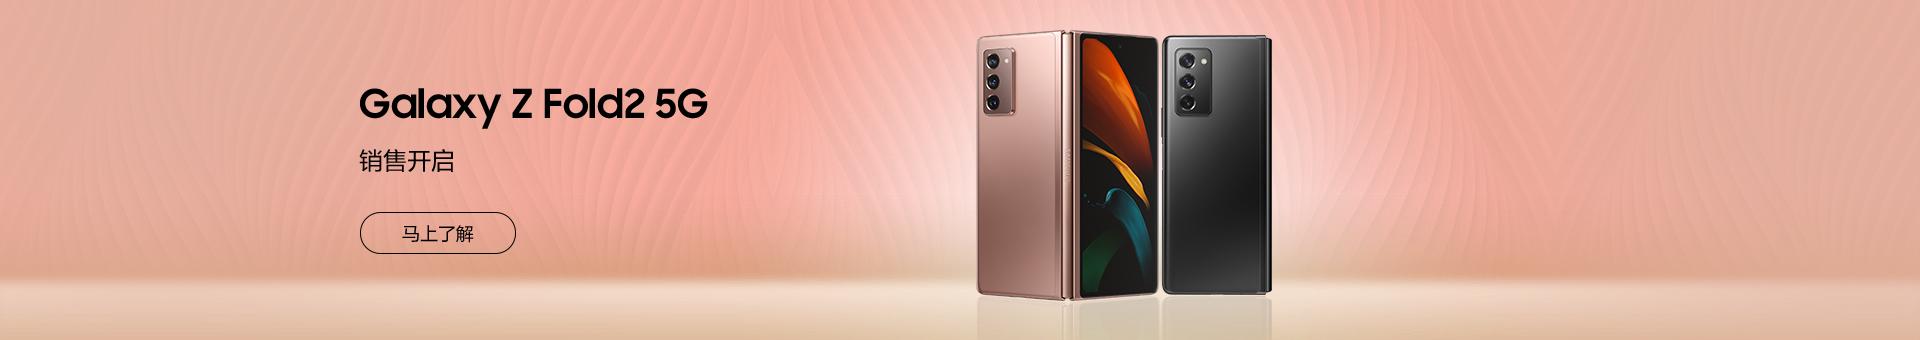 Galaxy Z Fold2 5G 预售开启